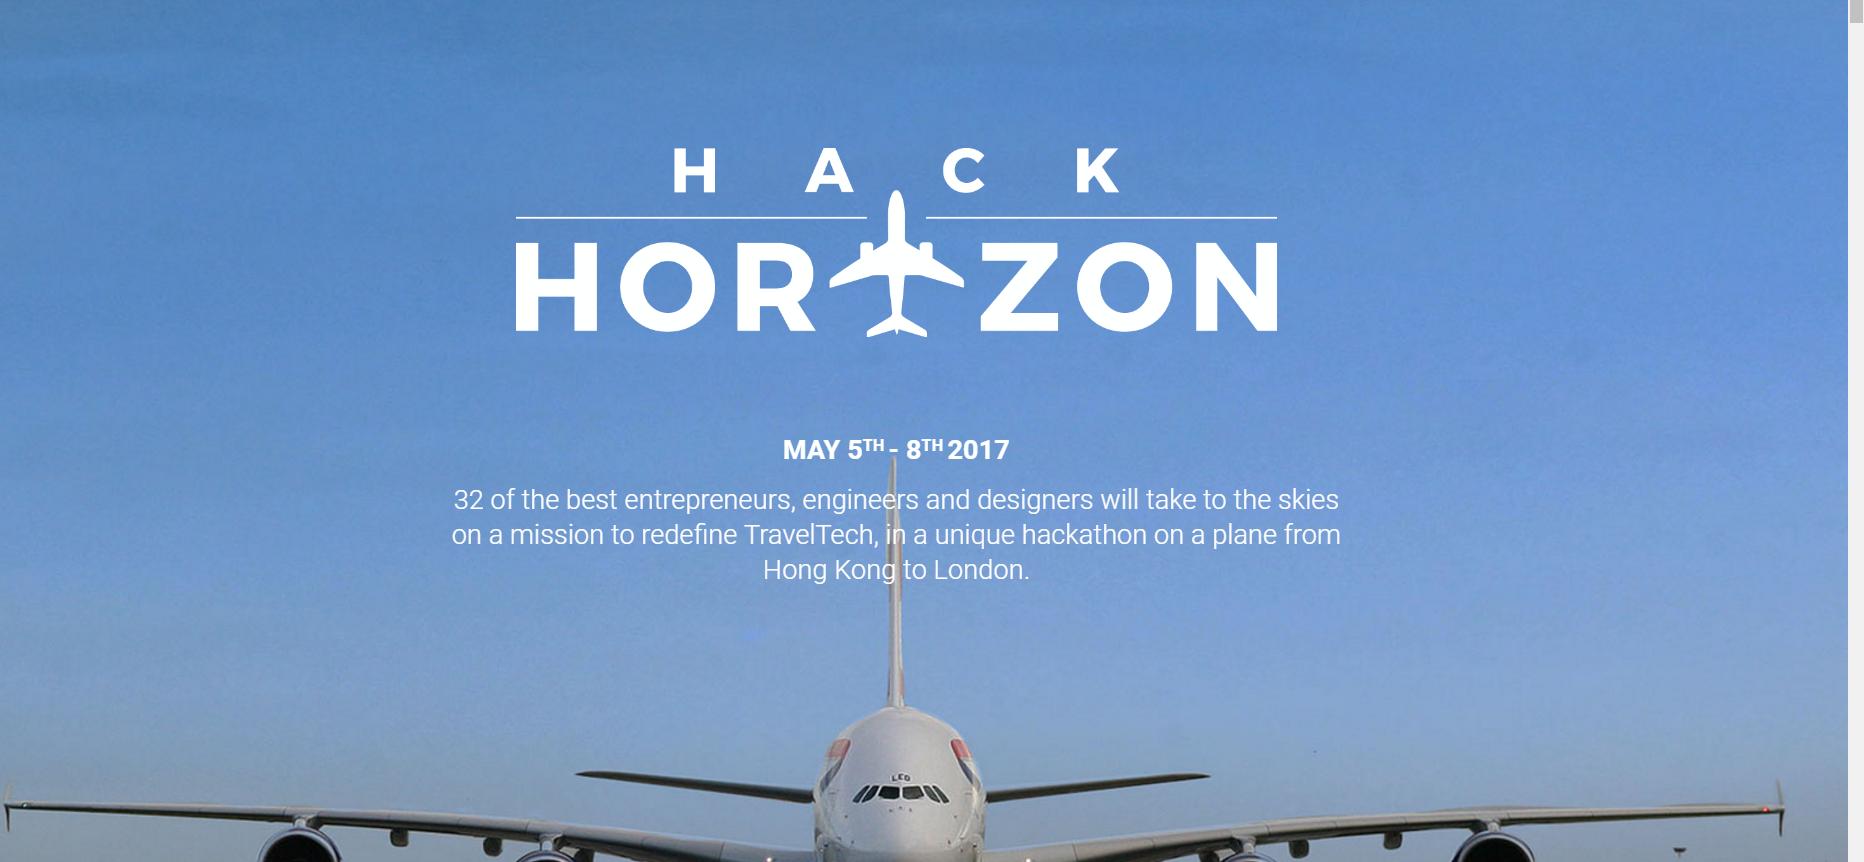 Hack Horizon